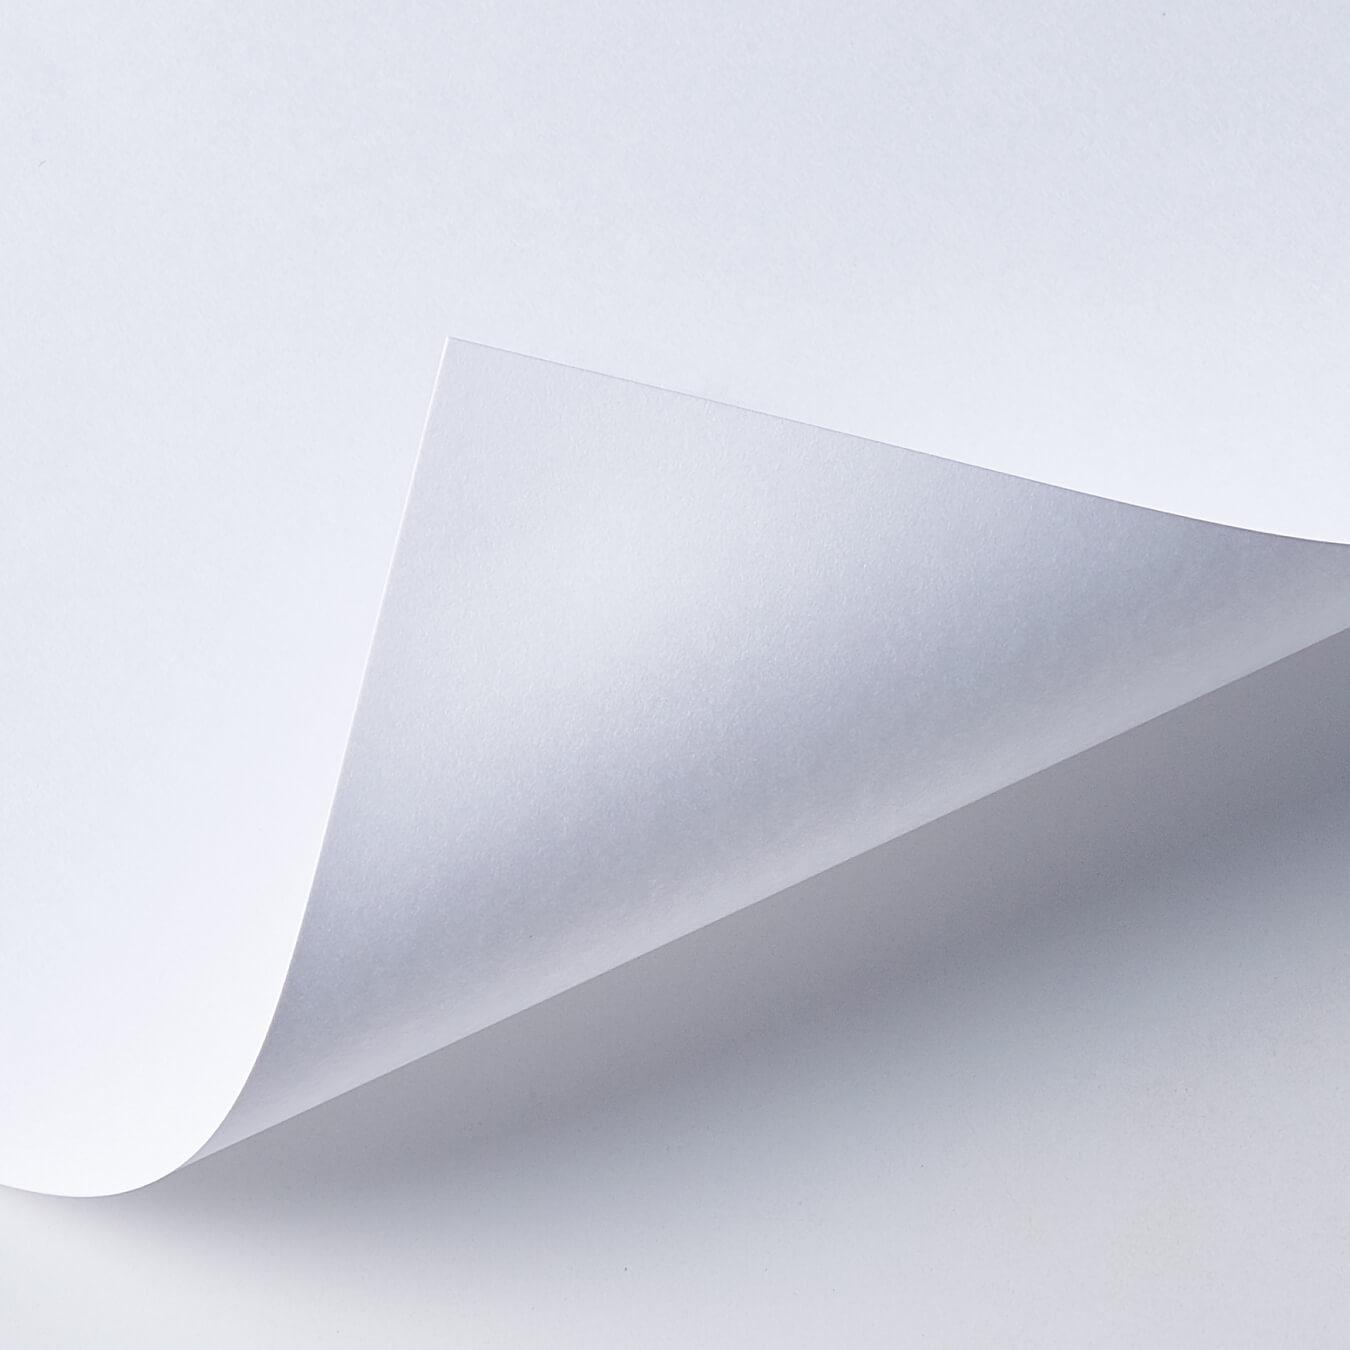 Datail of Custom Paper